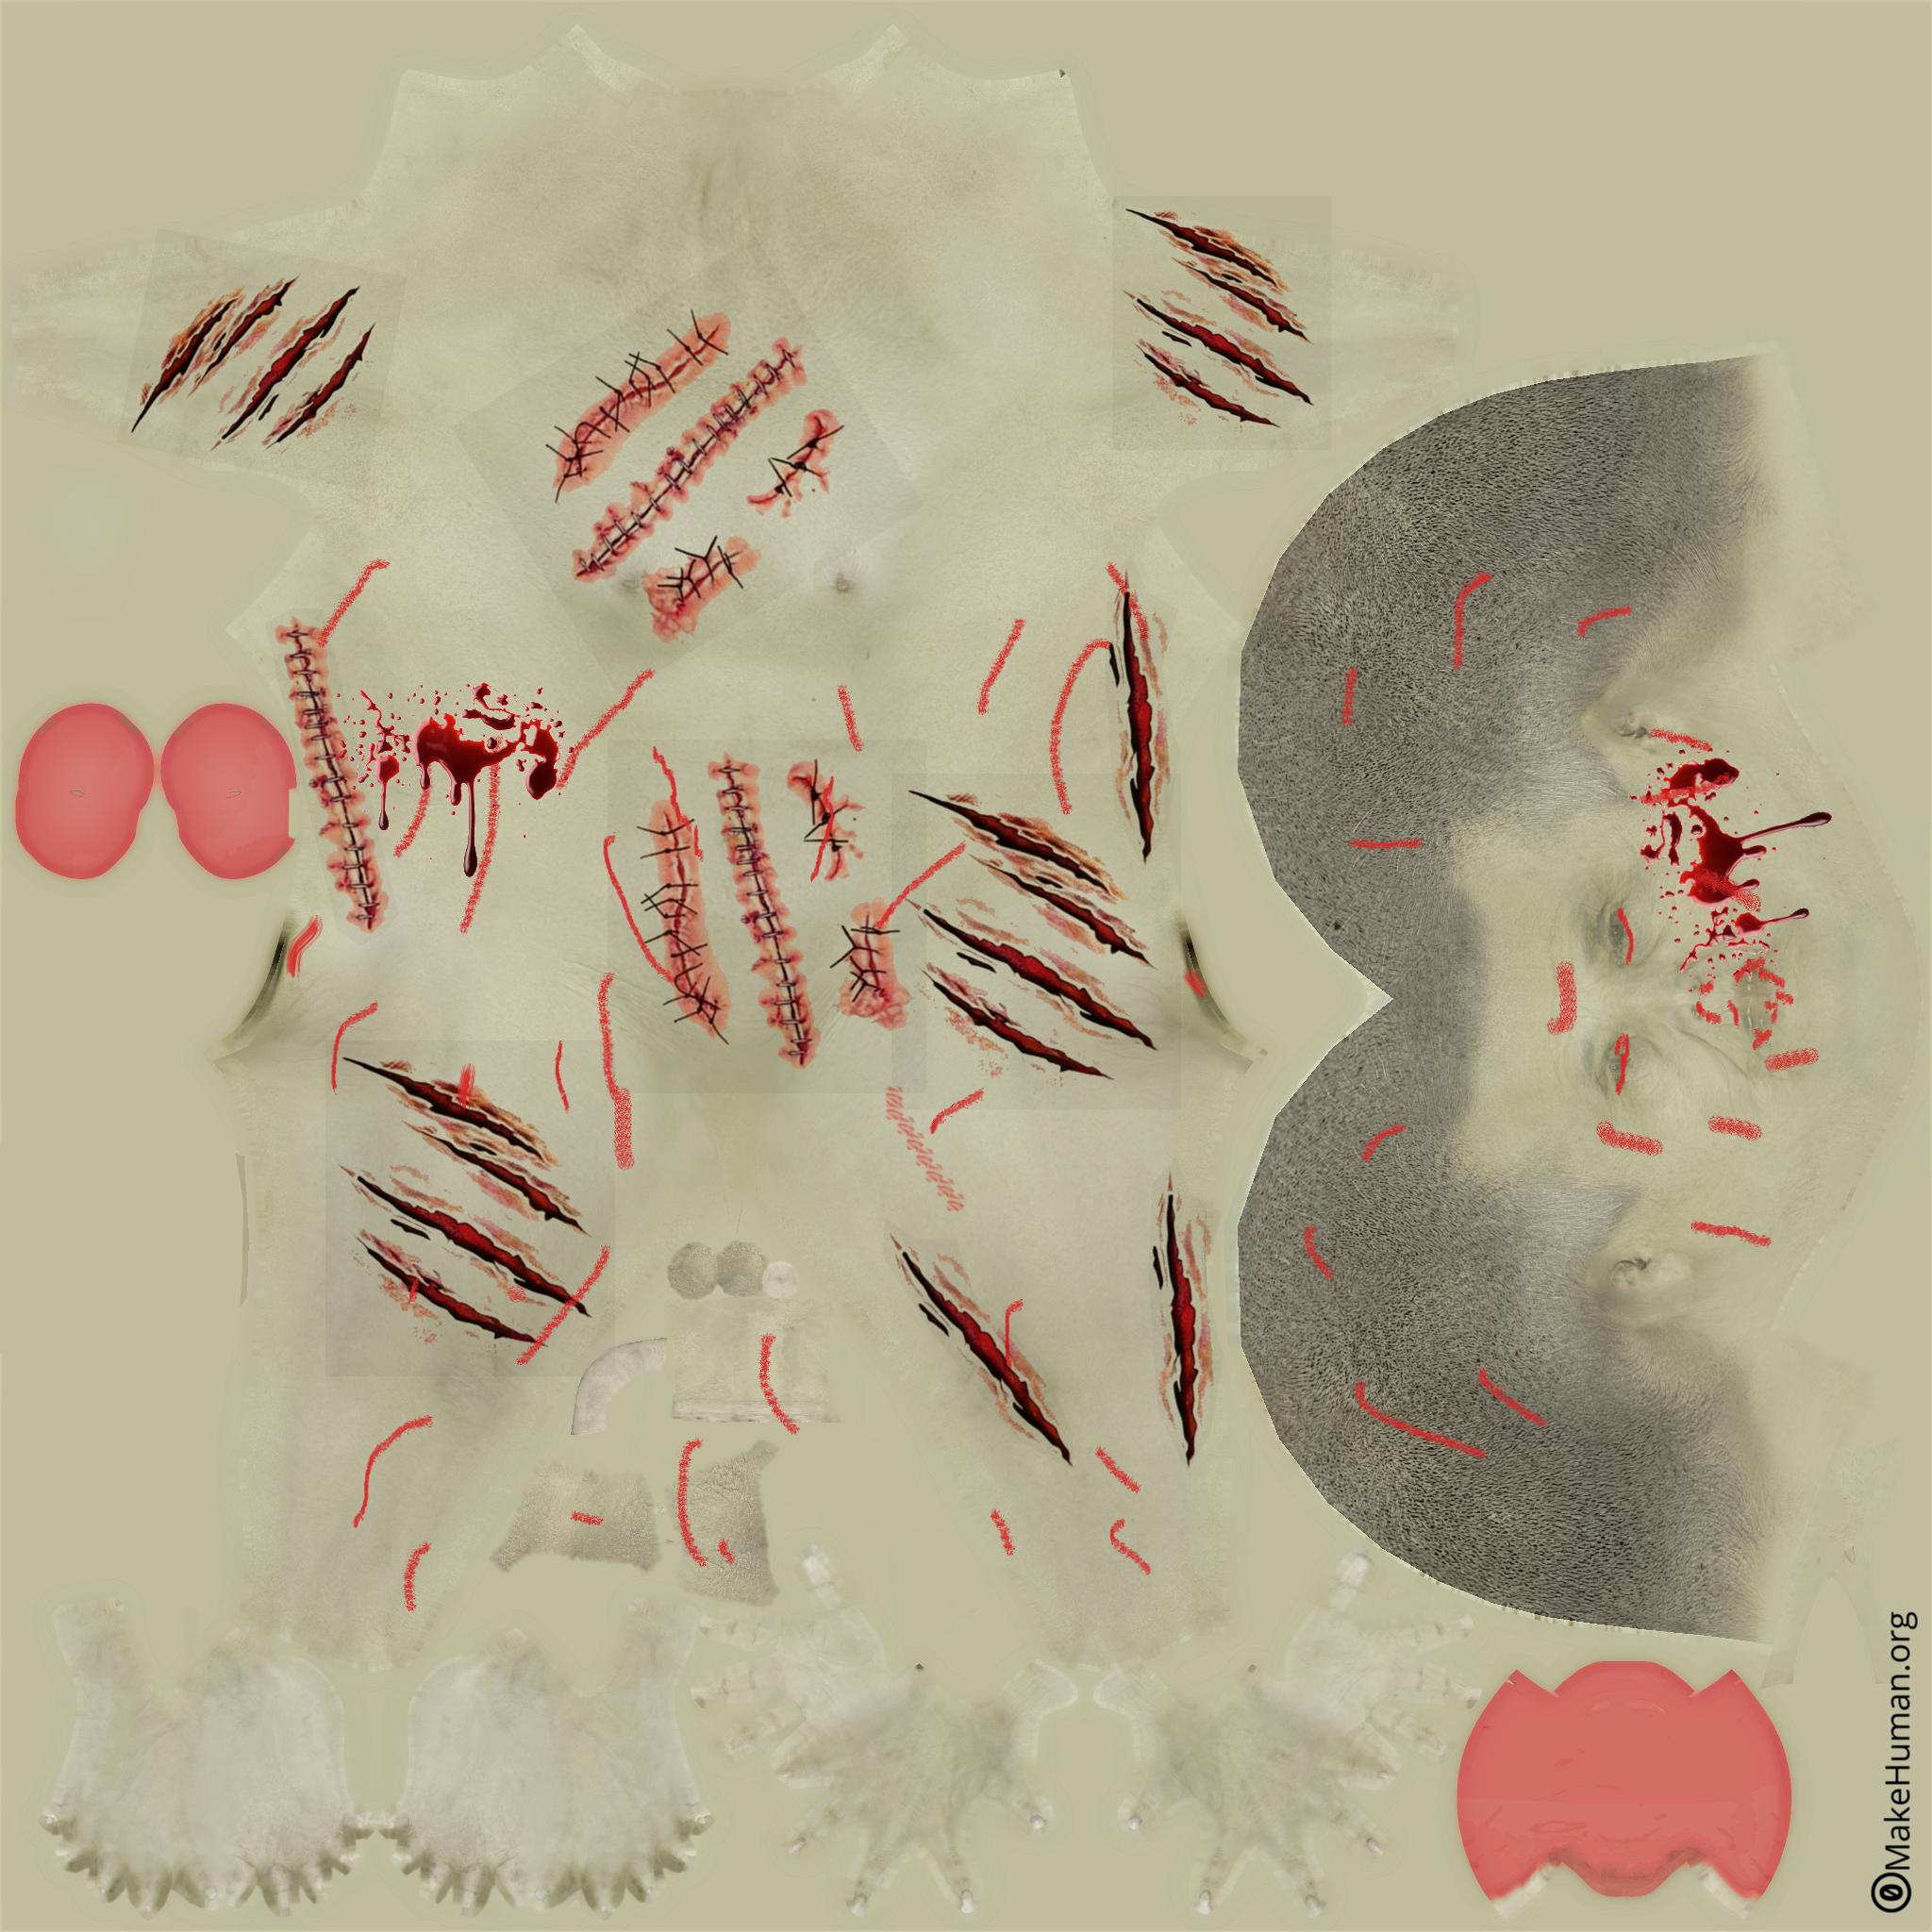 Collada/_EnPleinRepas/images/female_Zombie1 skin.png